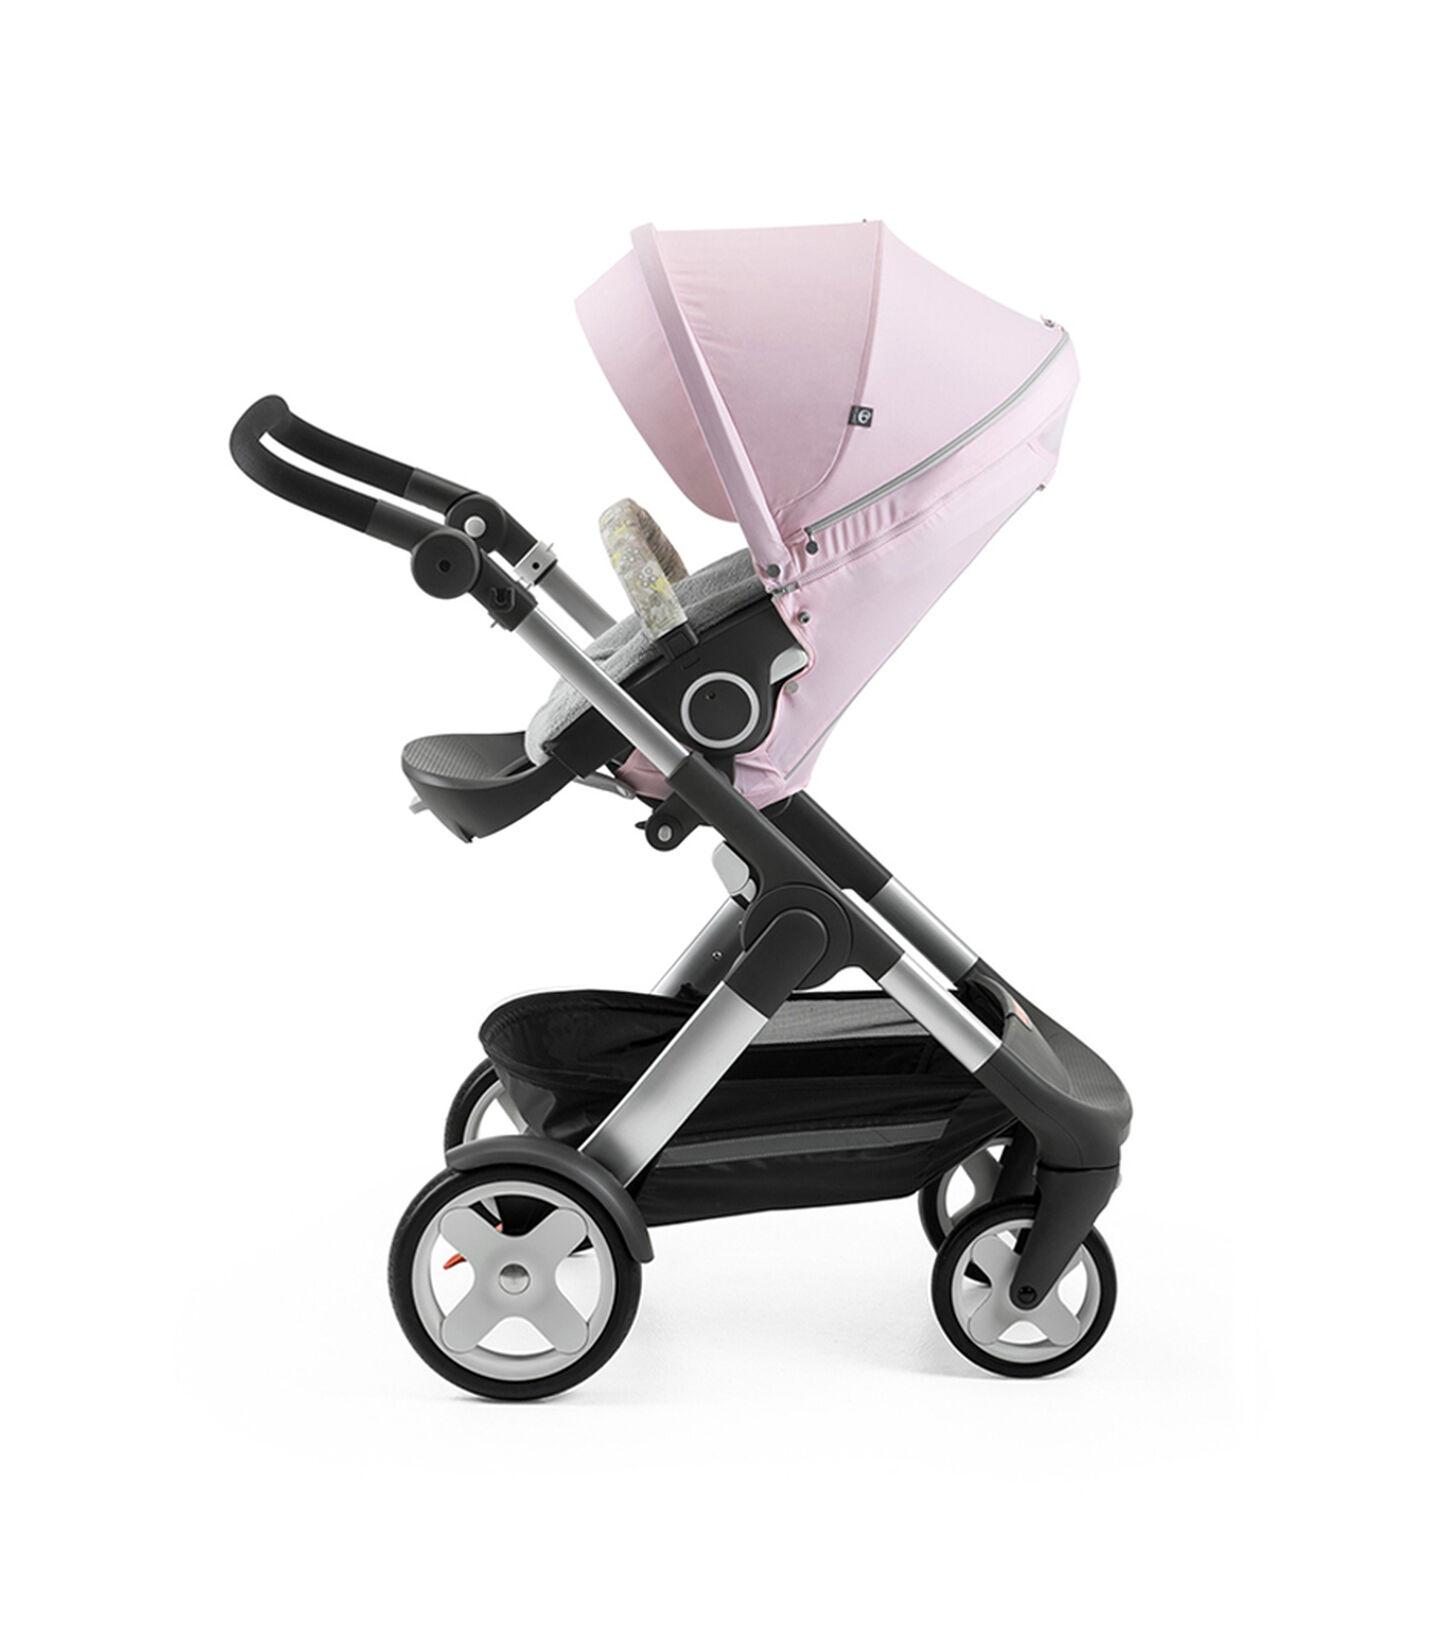 Stokke® Trailz™ with Stokke® Stroller Seat and Flora Pink Summer Kit.